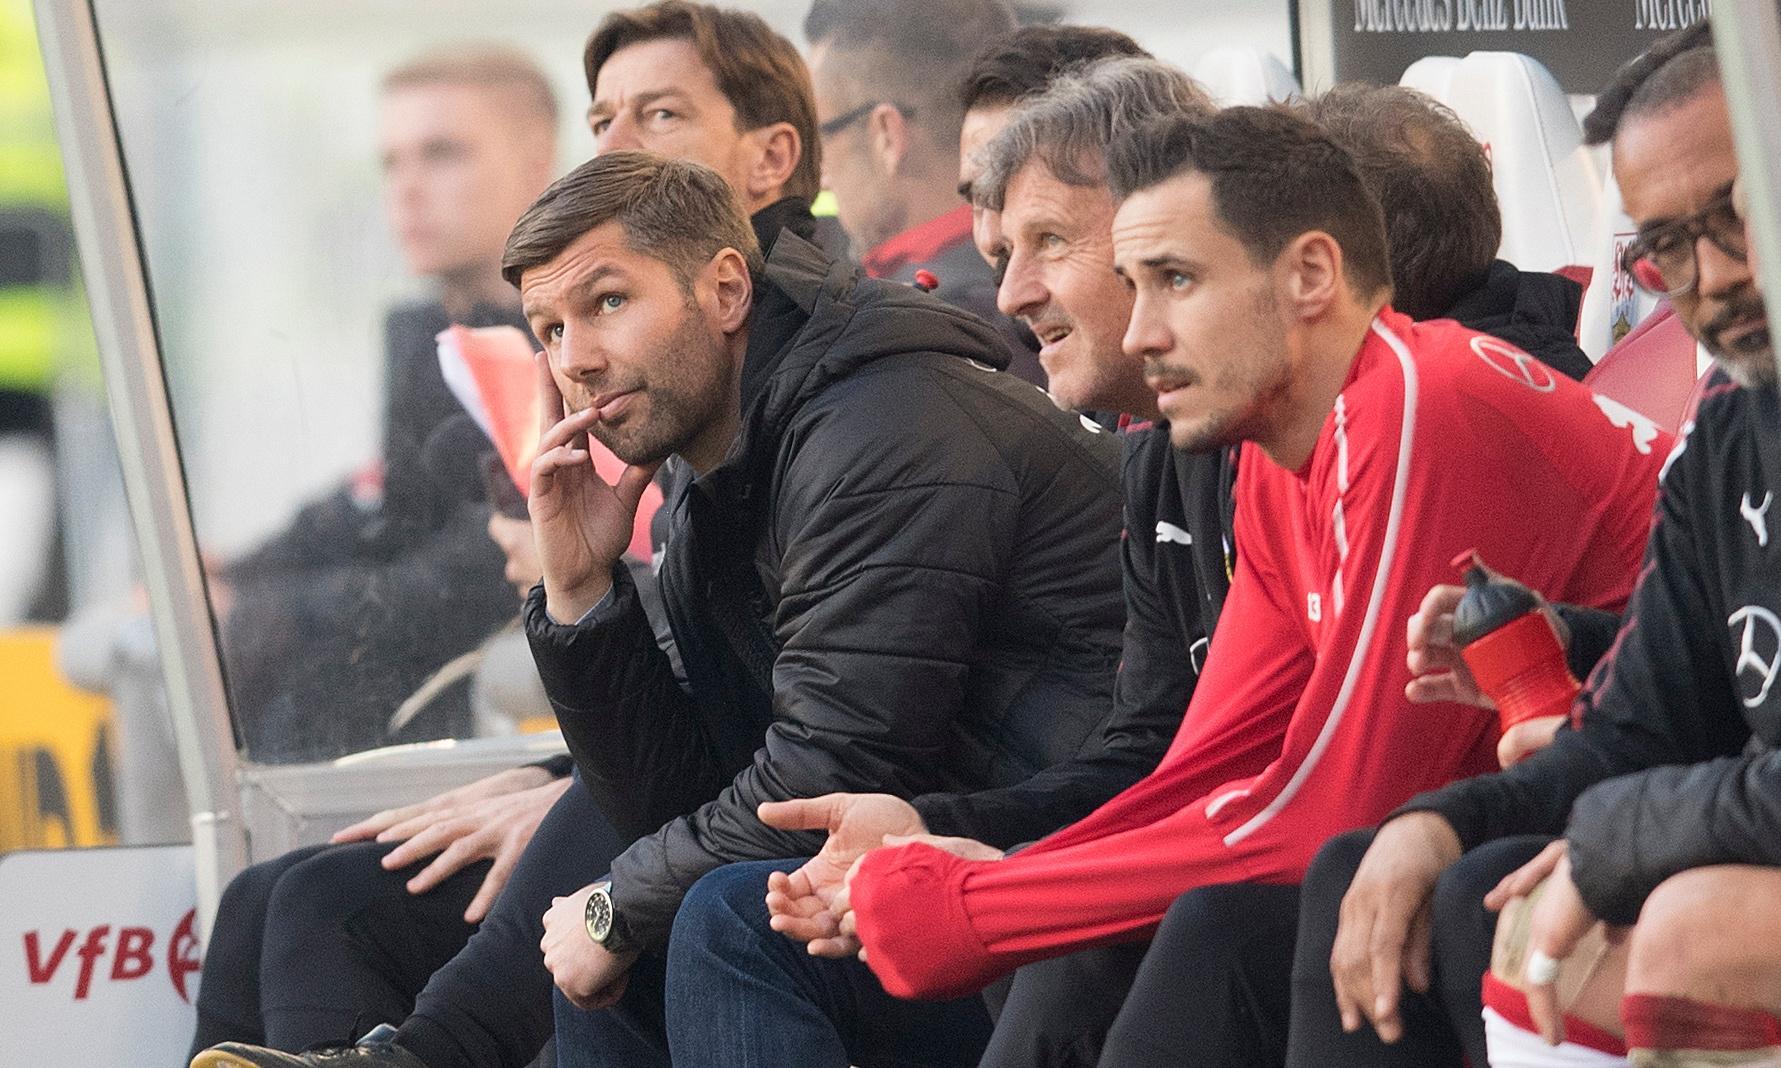 Thomas Hitzlsperger makes swift impact at struggling Stuttgart